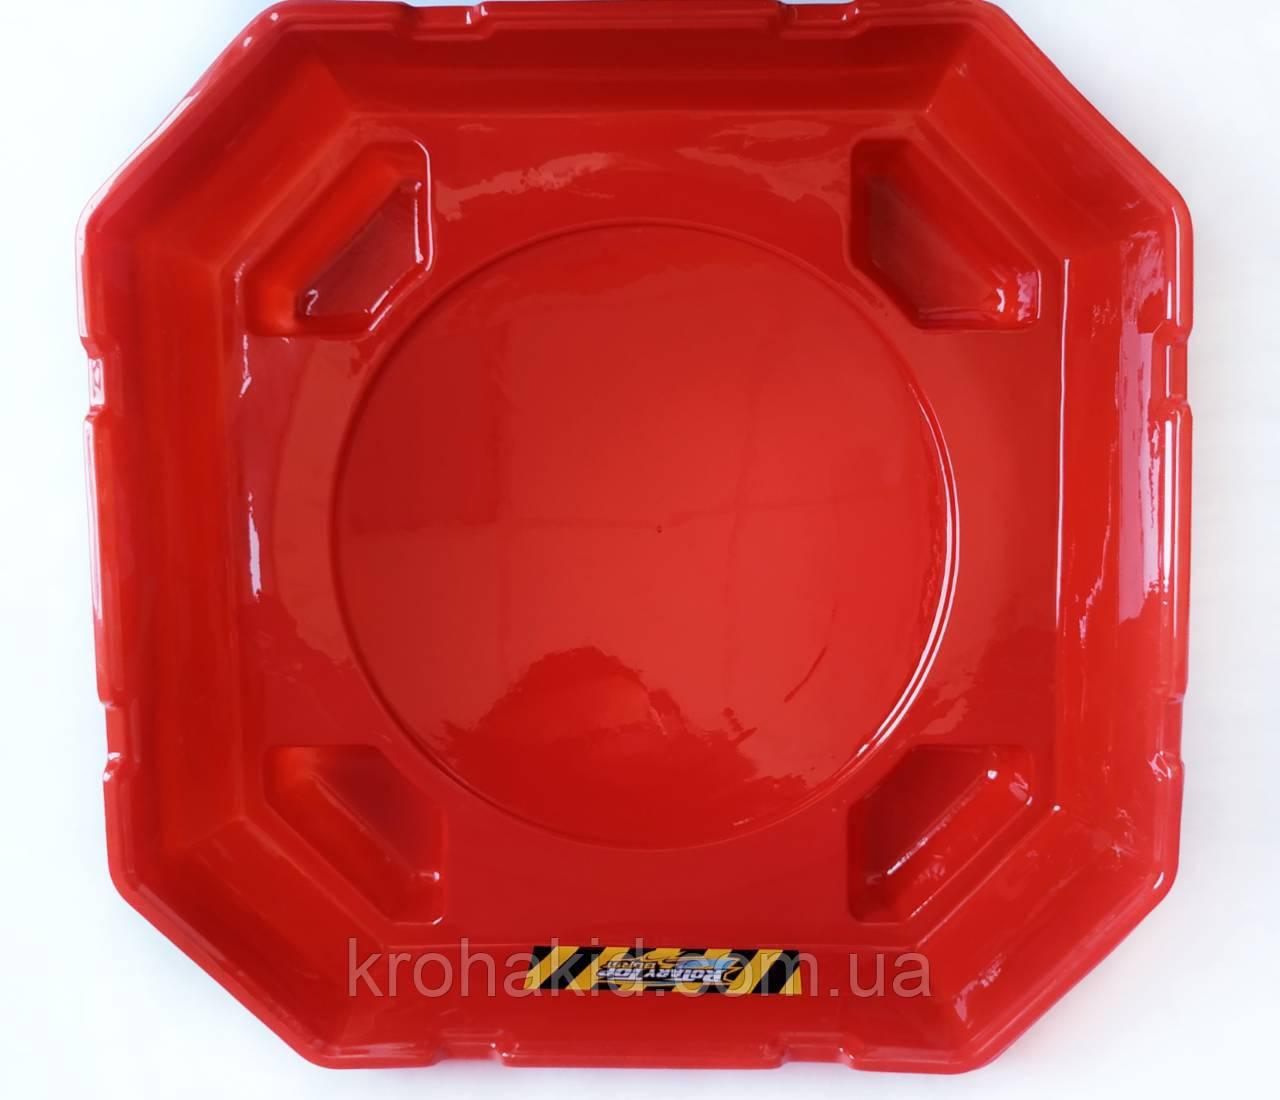 Арена для BeyBlade с ловушками 40 см (красная)